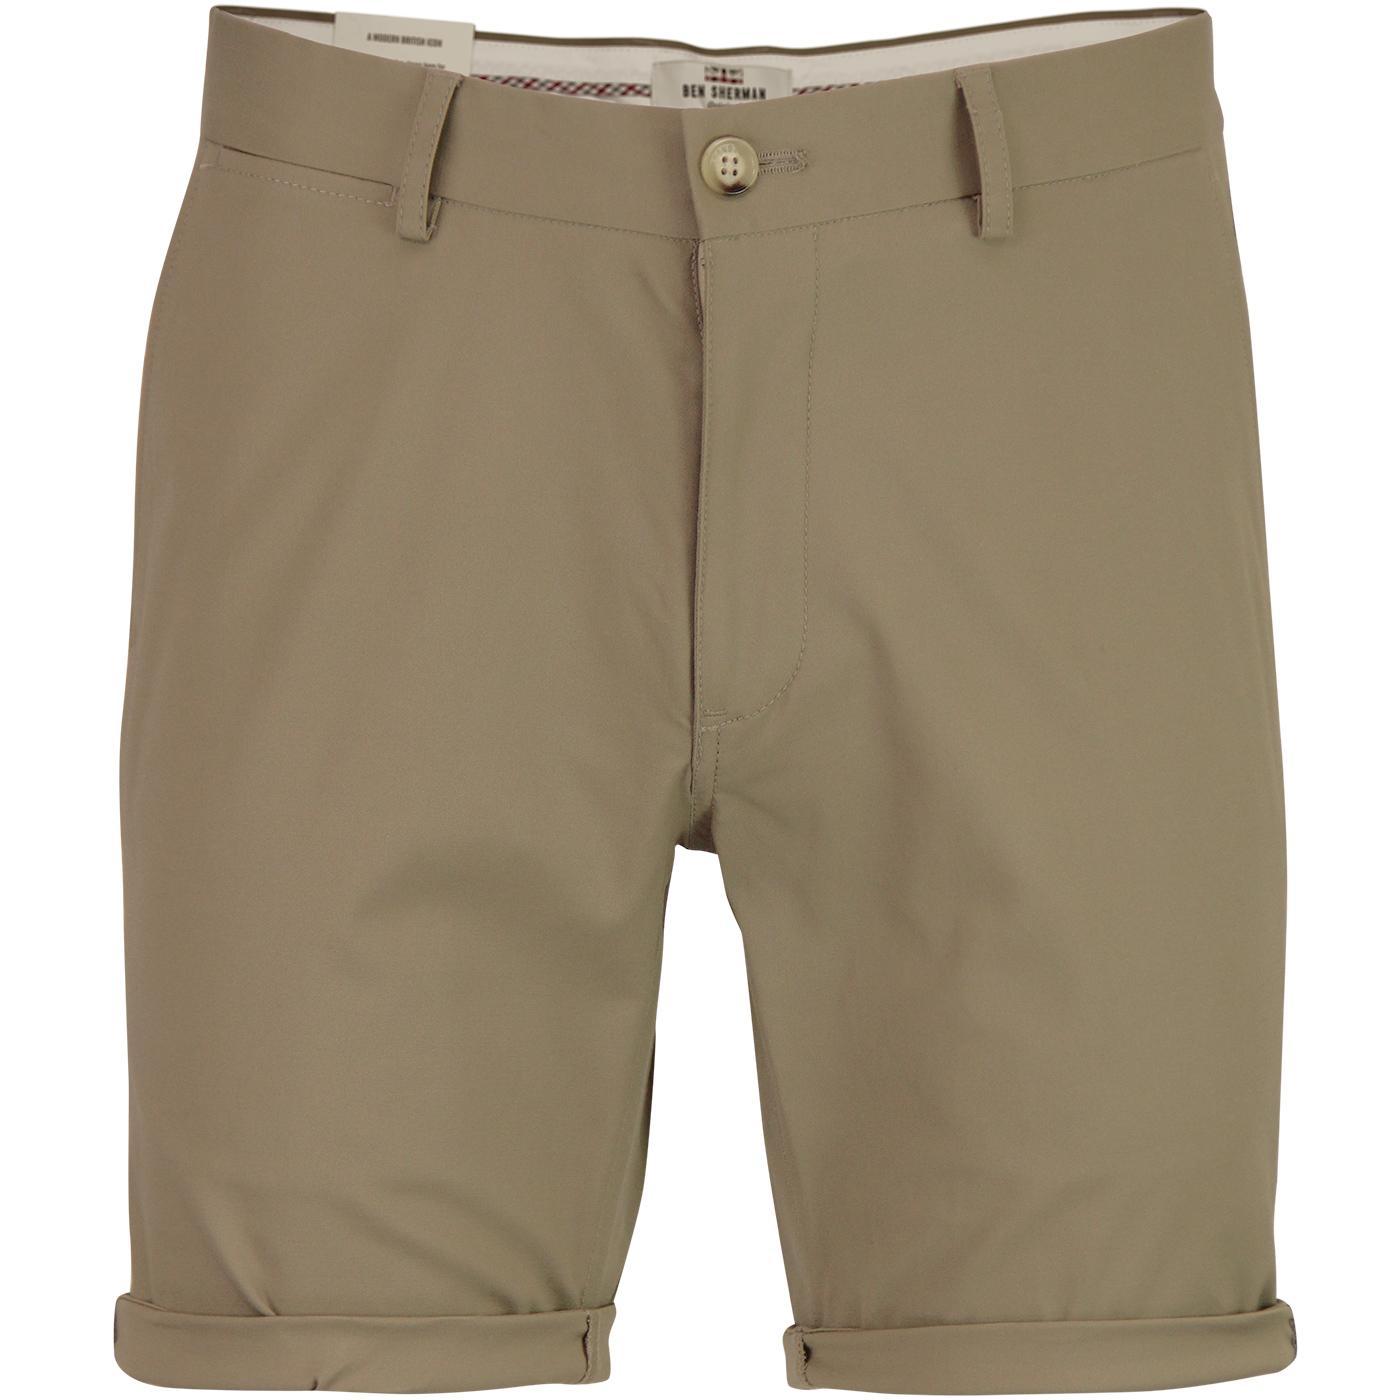 BEN SHERMAN Men's Retro Mod Chino Shorts (Stone)